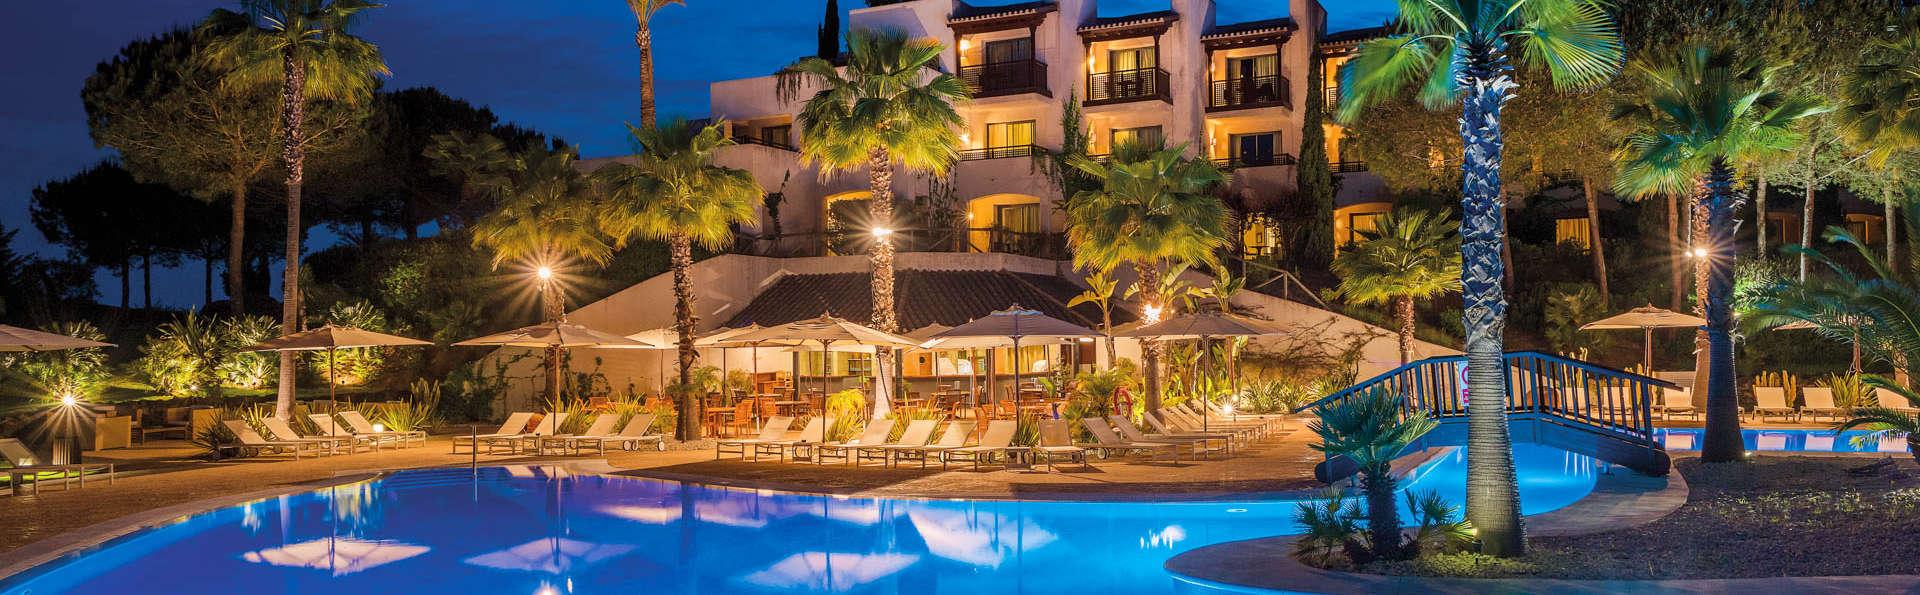 Precise Resort El Rompido Hotel - EDIT_Exterior-2.jpg